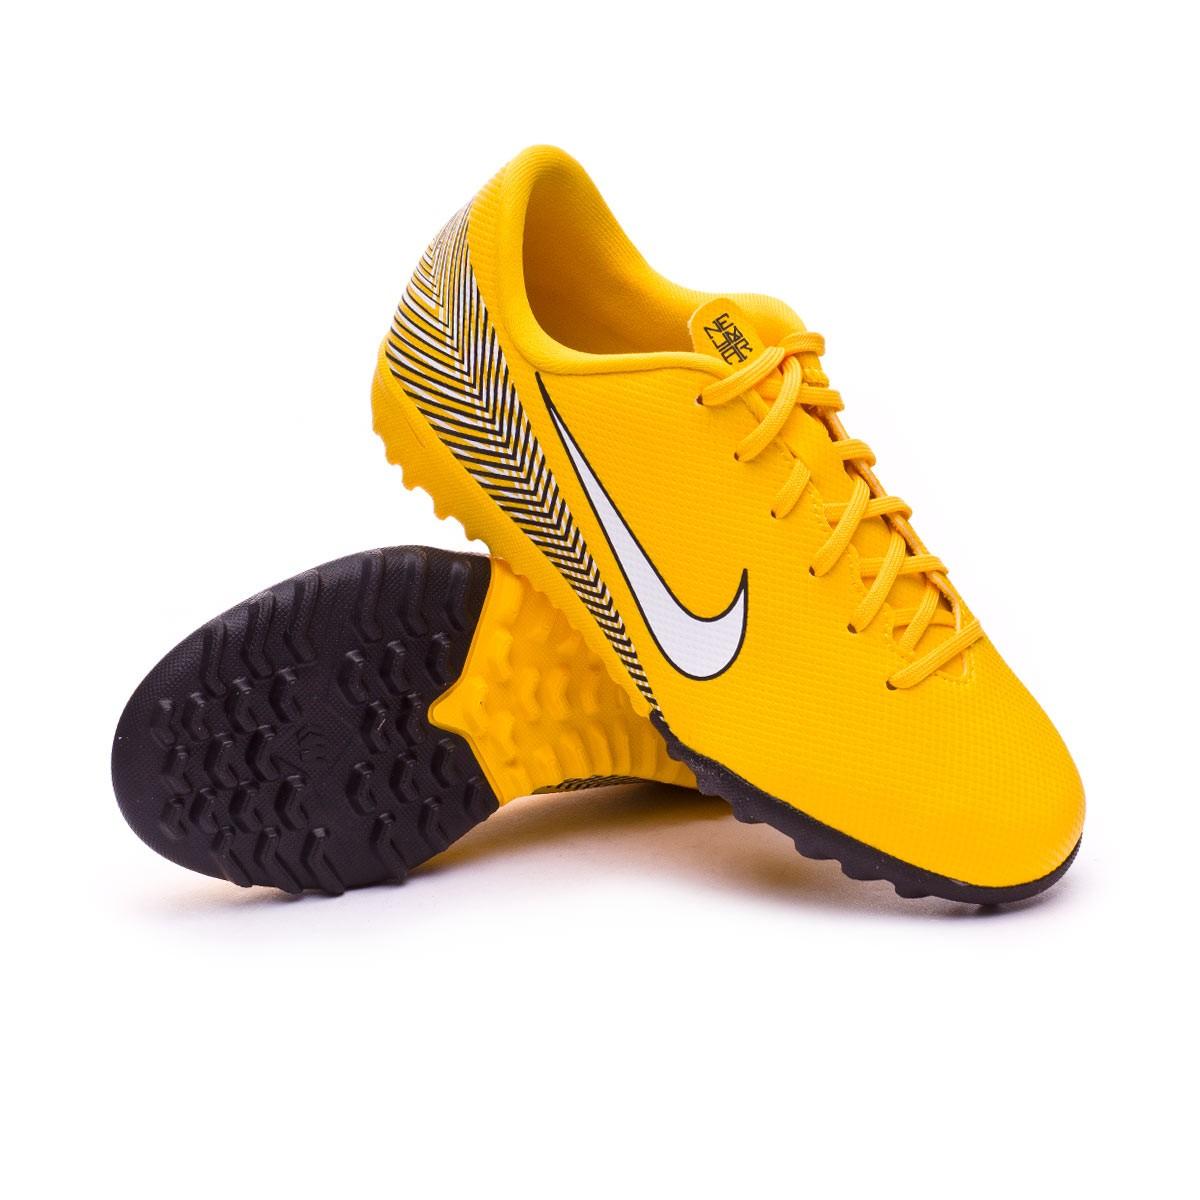 6d86d9505f284 Tenis Nike Mercurial VaporX XII Academy Turf Neymar Niño Yellow-Black -  Tienda de fútbol Fútbol Emotion